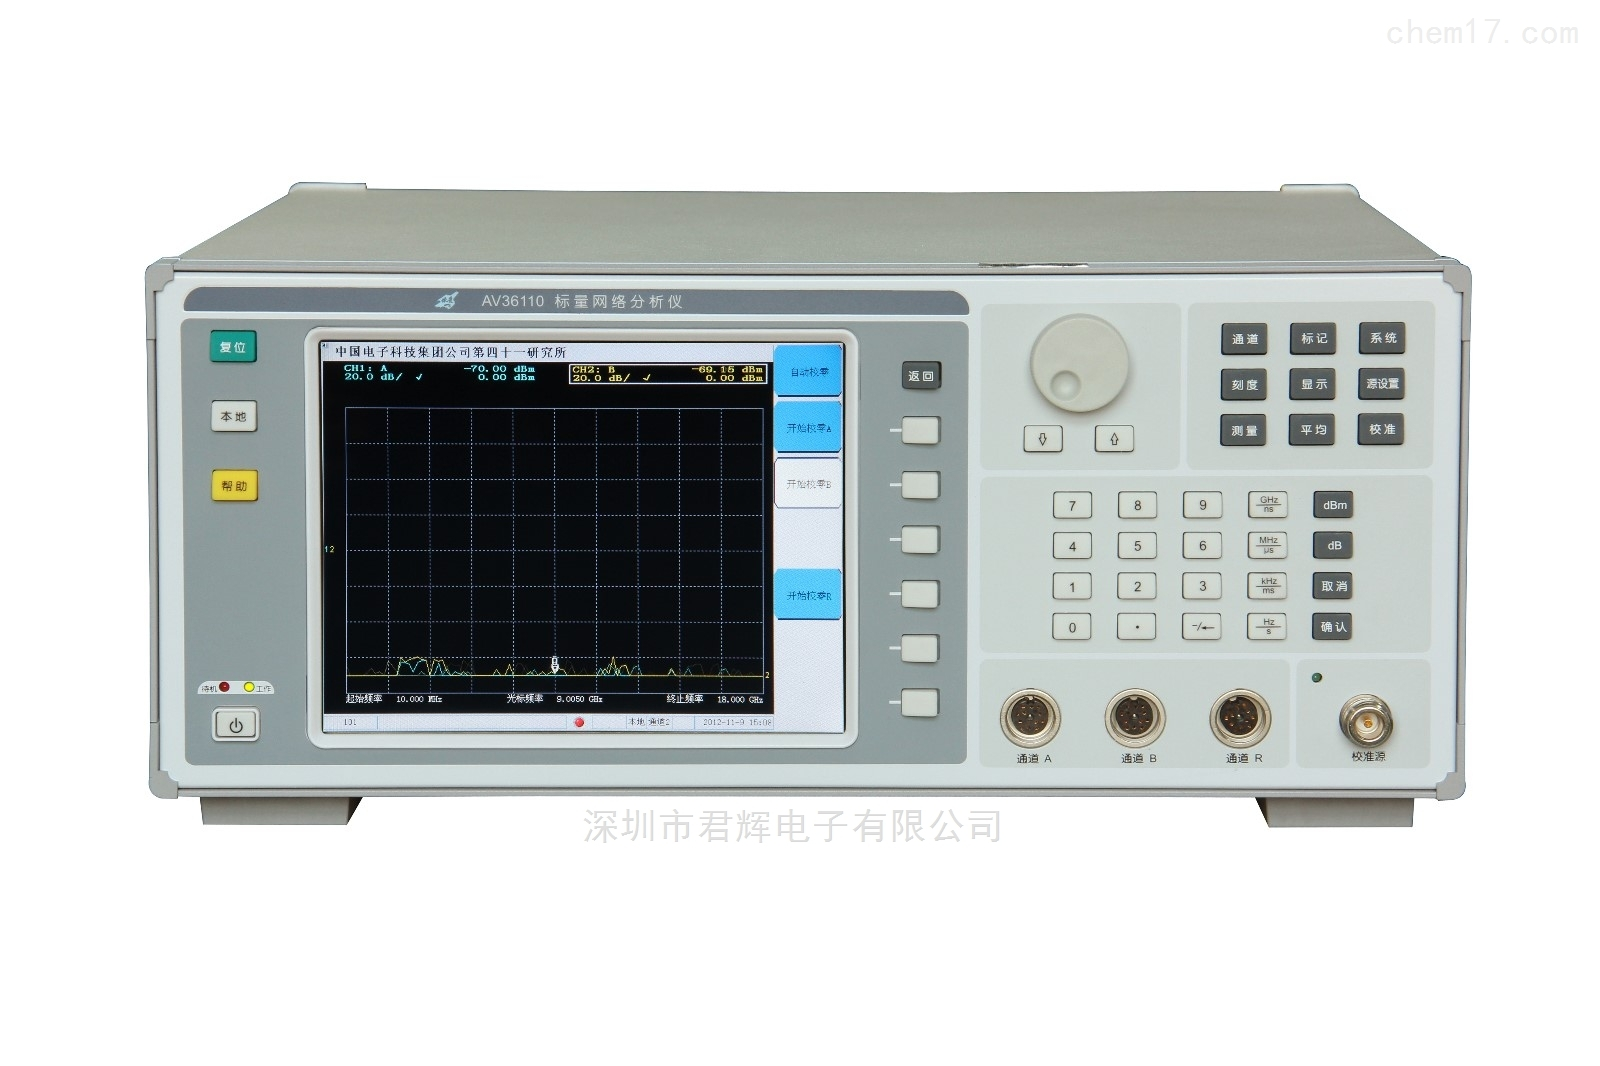 ceyear思仪36110标量网络分析仪